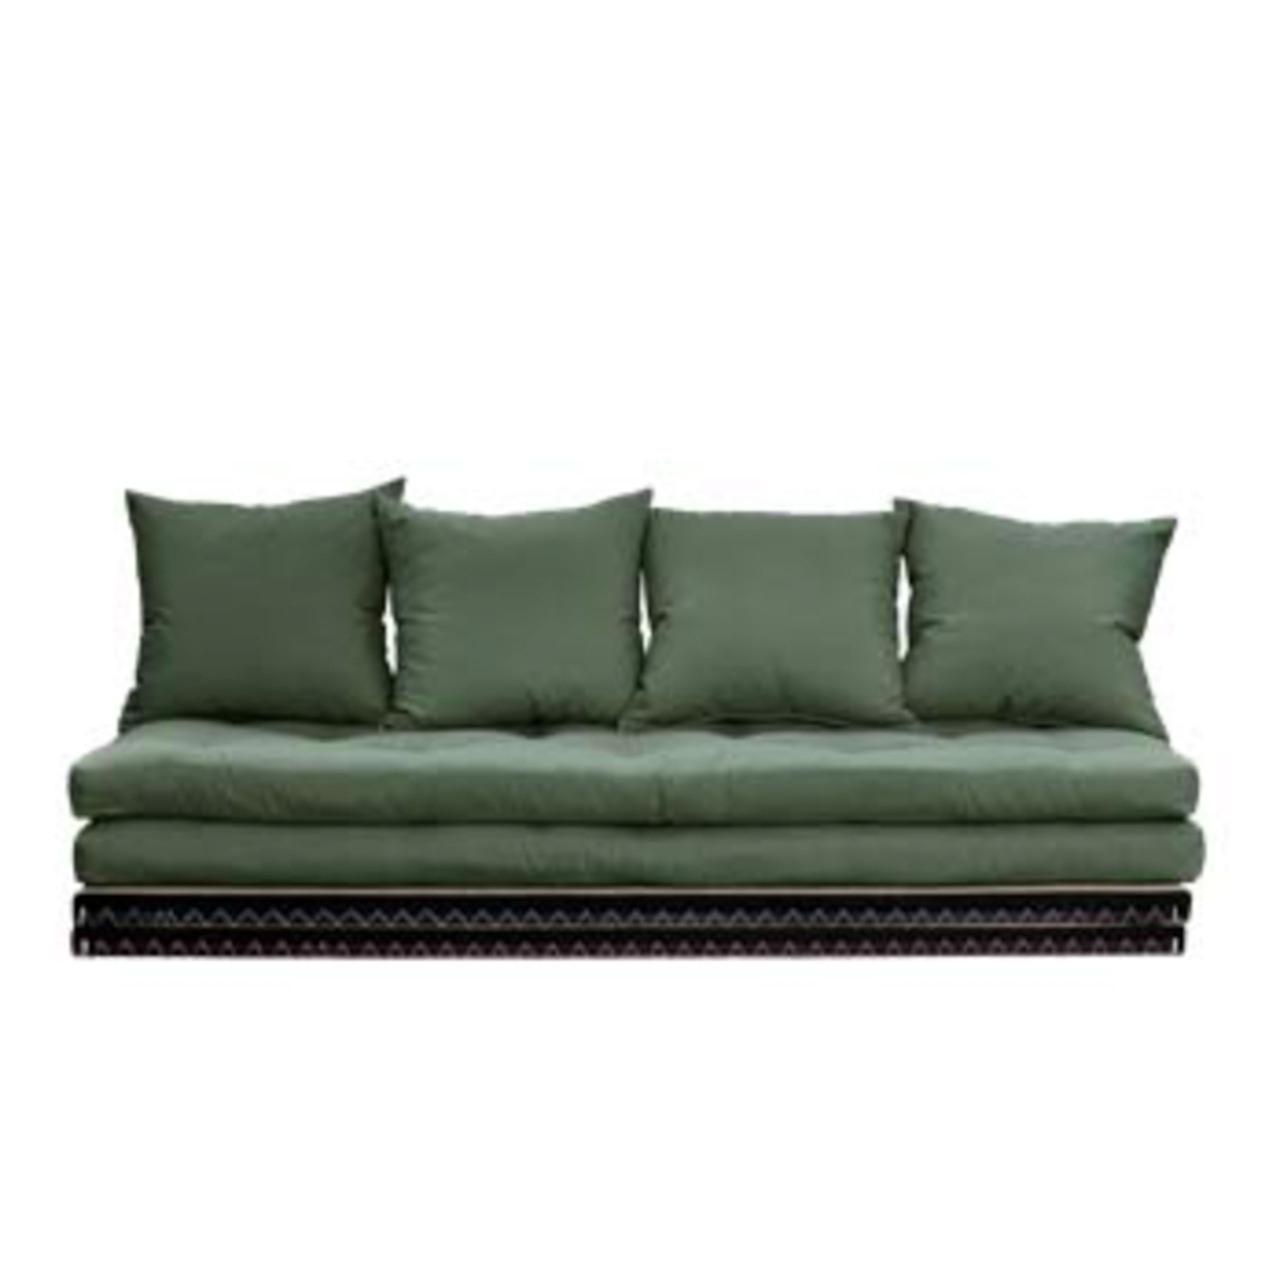 Karup Design Schlafsofa 'Chico' Olivgrün